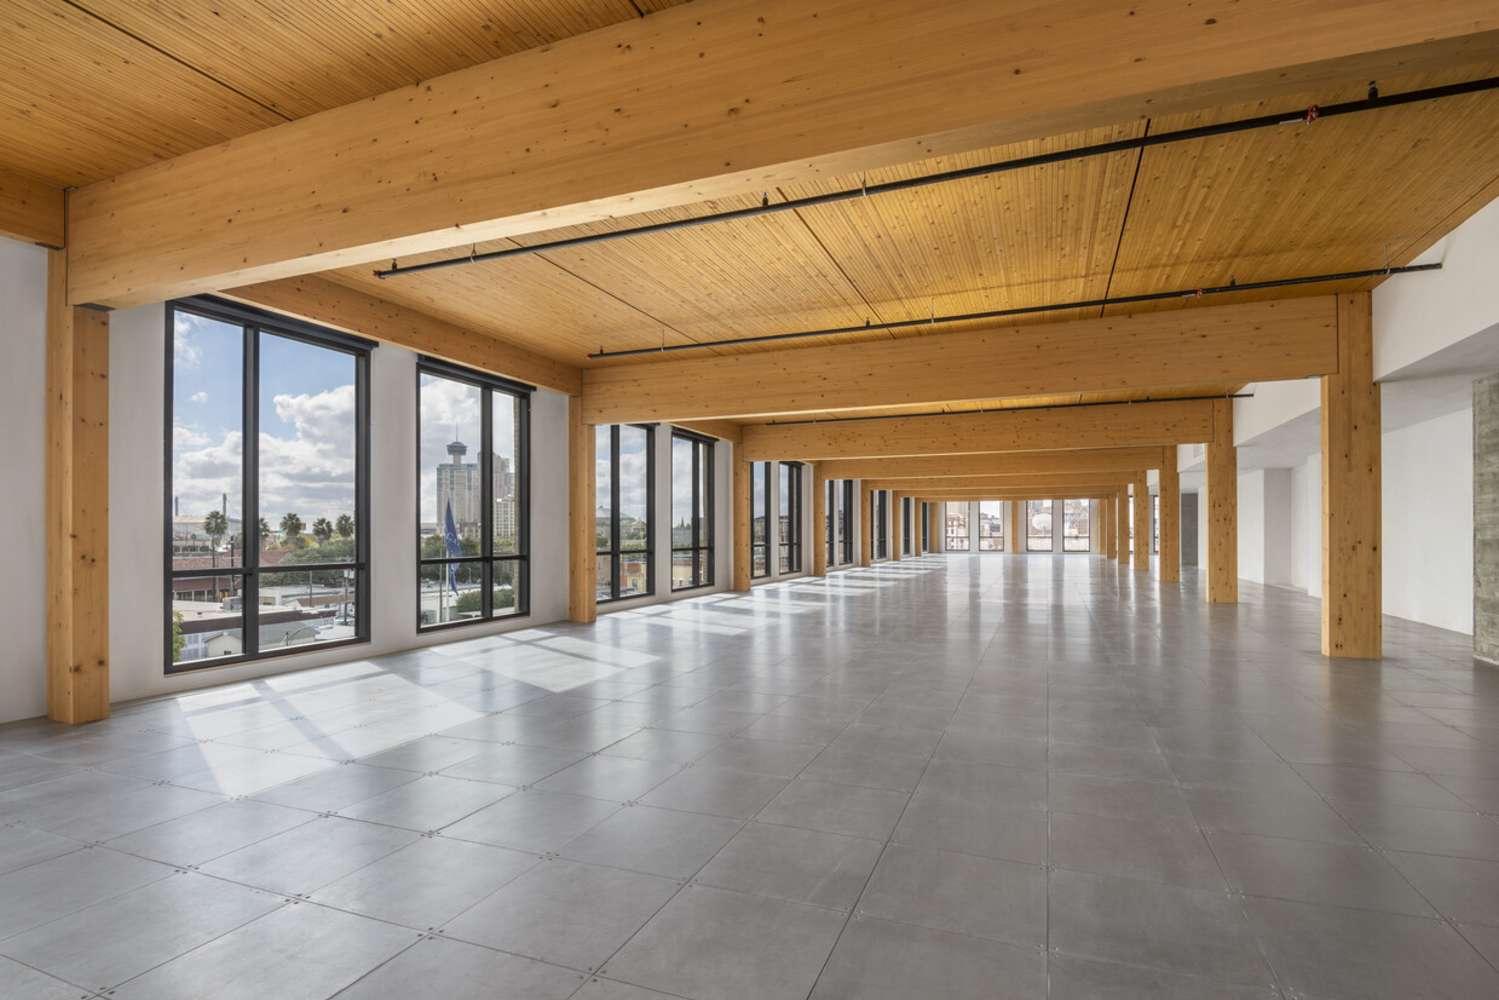 Office San antonio, 78215 - The Soto Building